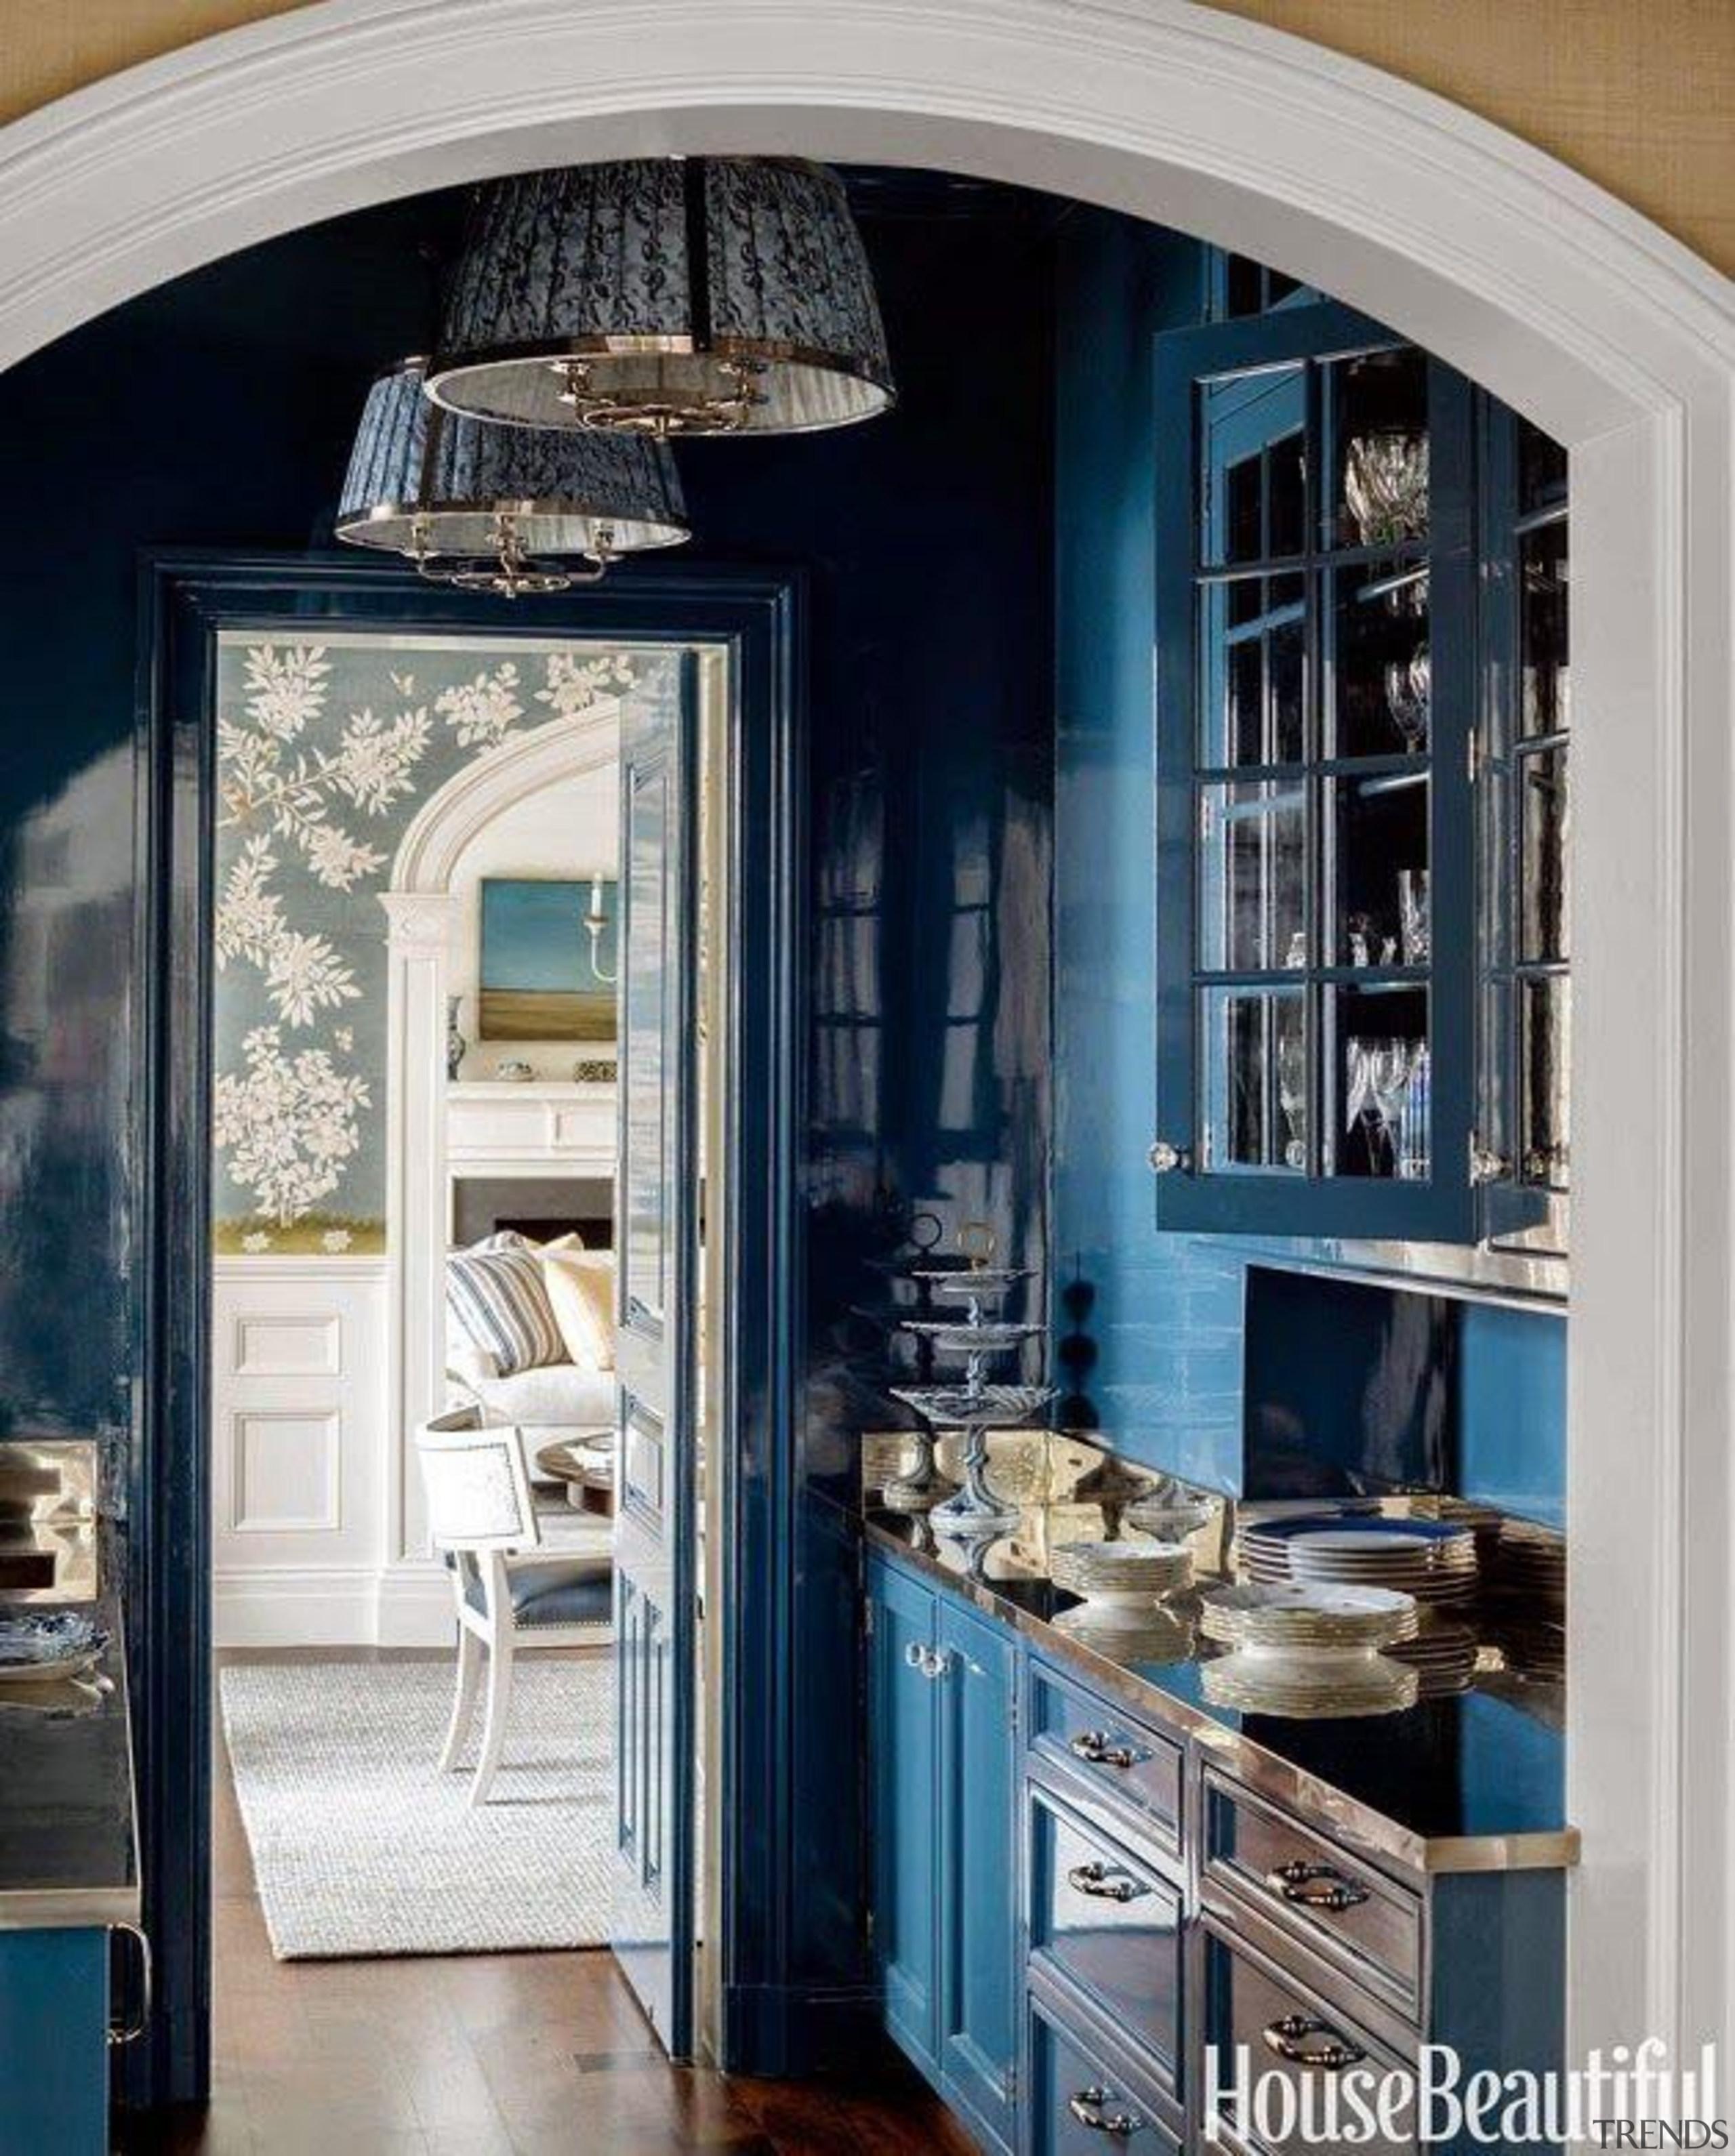 cerulean  housebeautifulcom.jpg - cerulean__housebeautifulcom.jpg - home   home, interior design, room, window, gray, black